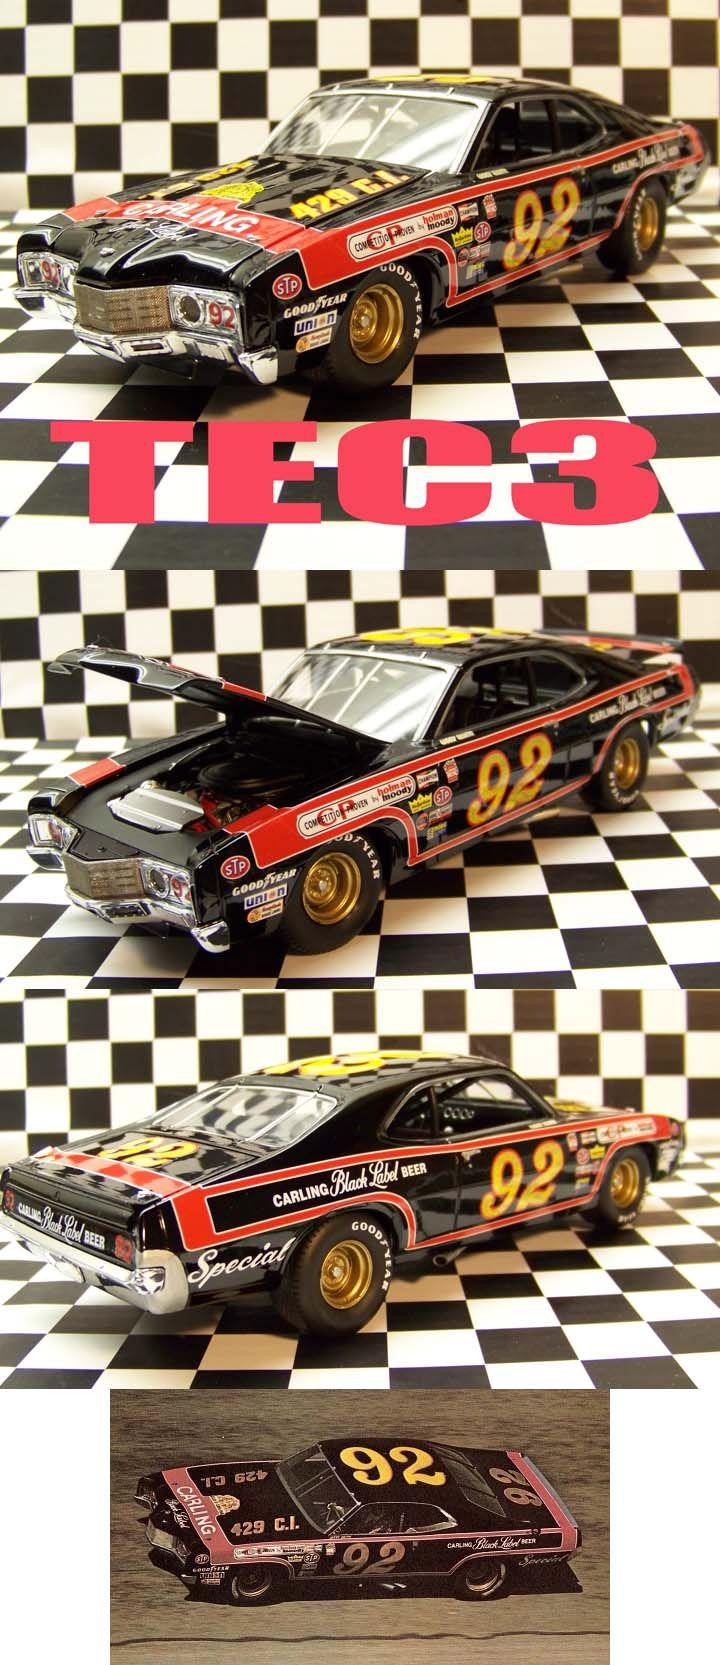 Dean Dalton NASCAR | 1971 Larry S mith Carling Beer Mercury.